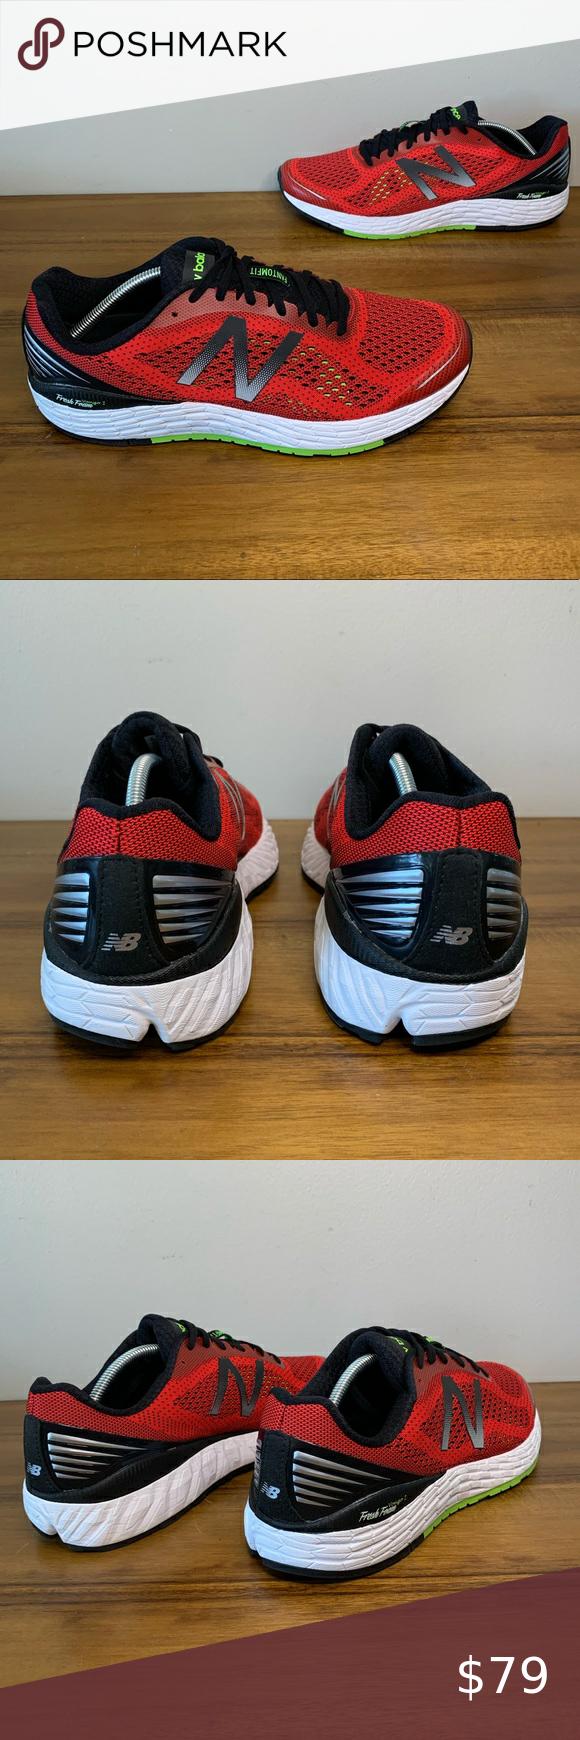 New Balance Fresh Foam Vongo V2 Mens Running Shoes Running Shoes For Men Mens Walking Shoes New Balance Fresh Foam